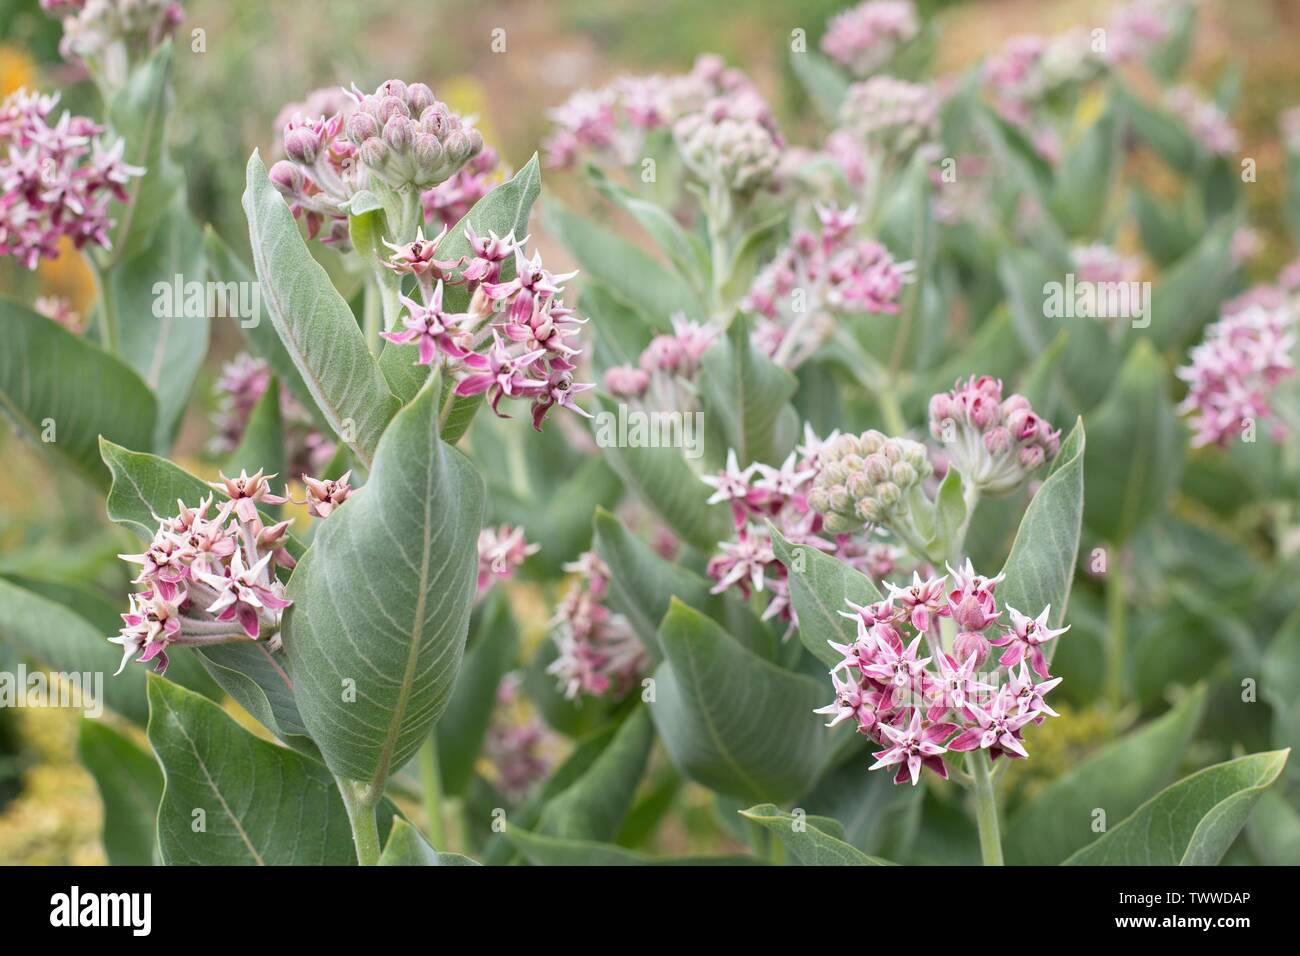 Asclepias speciosa 'Showy Milkweed' flowers. - Stock Image